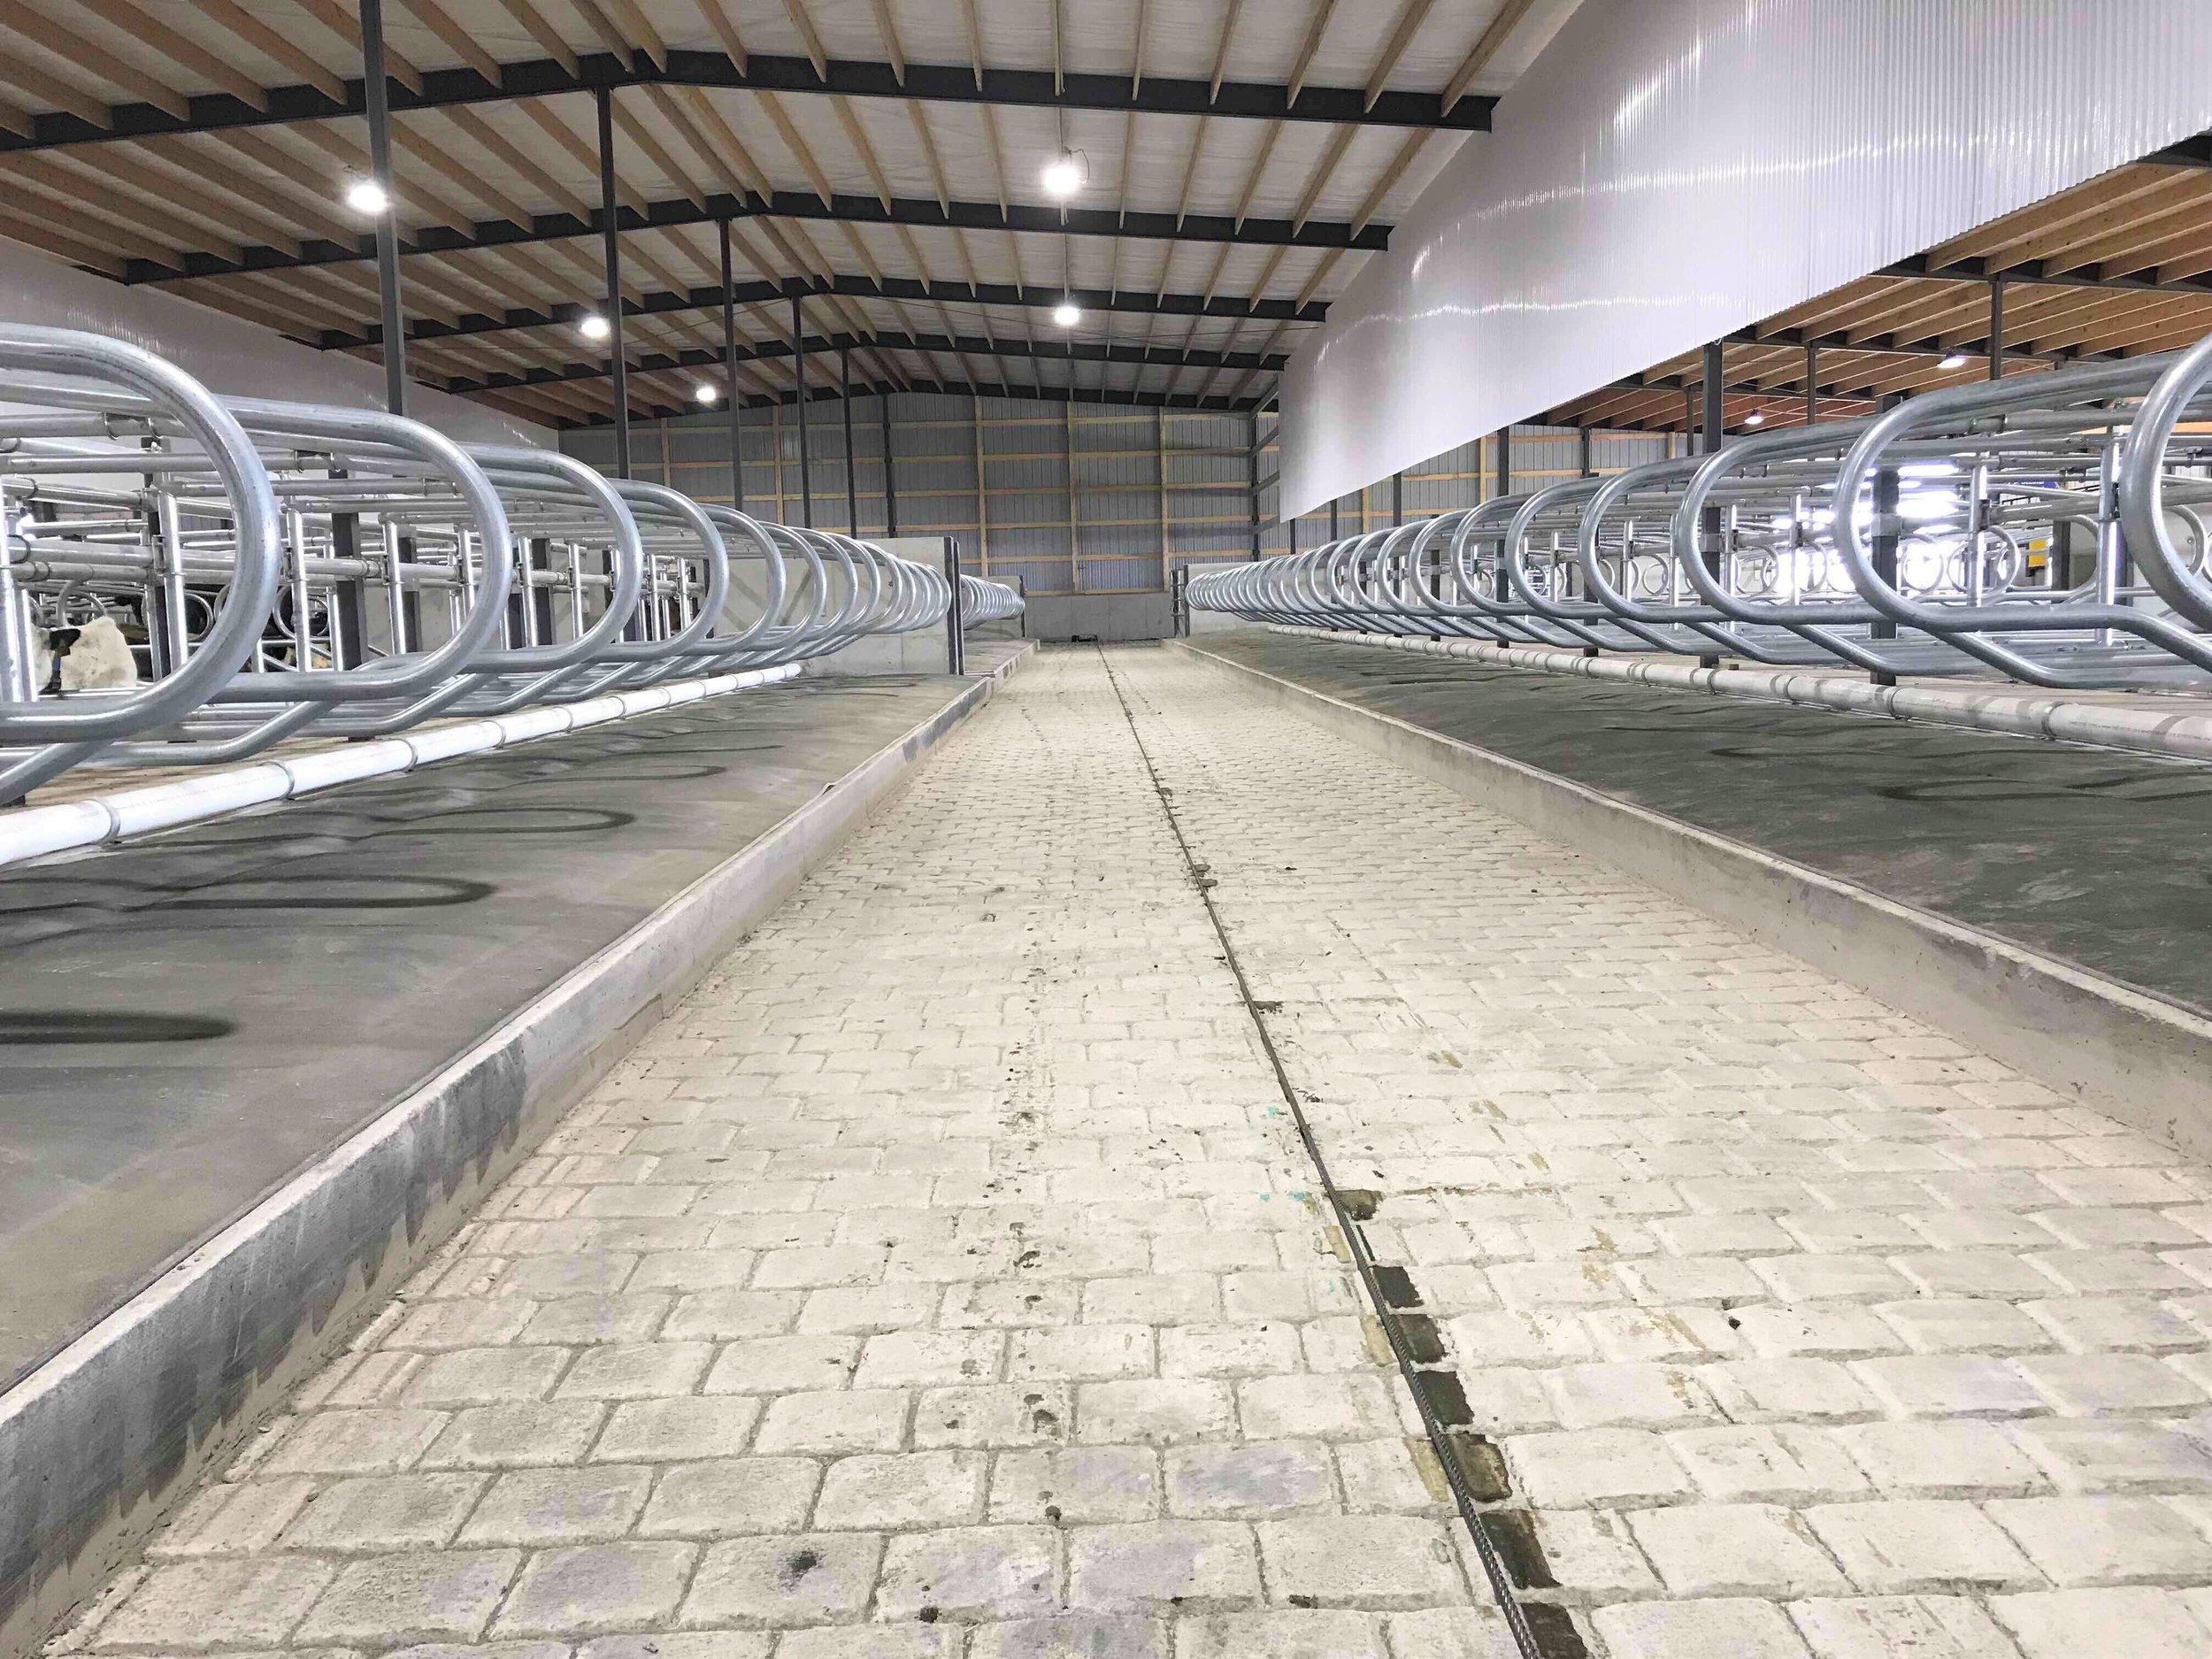 DIEDERICH FARM ROBOT BARN - DE PERE, WISCONSIN